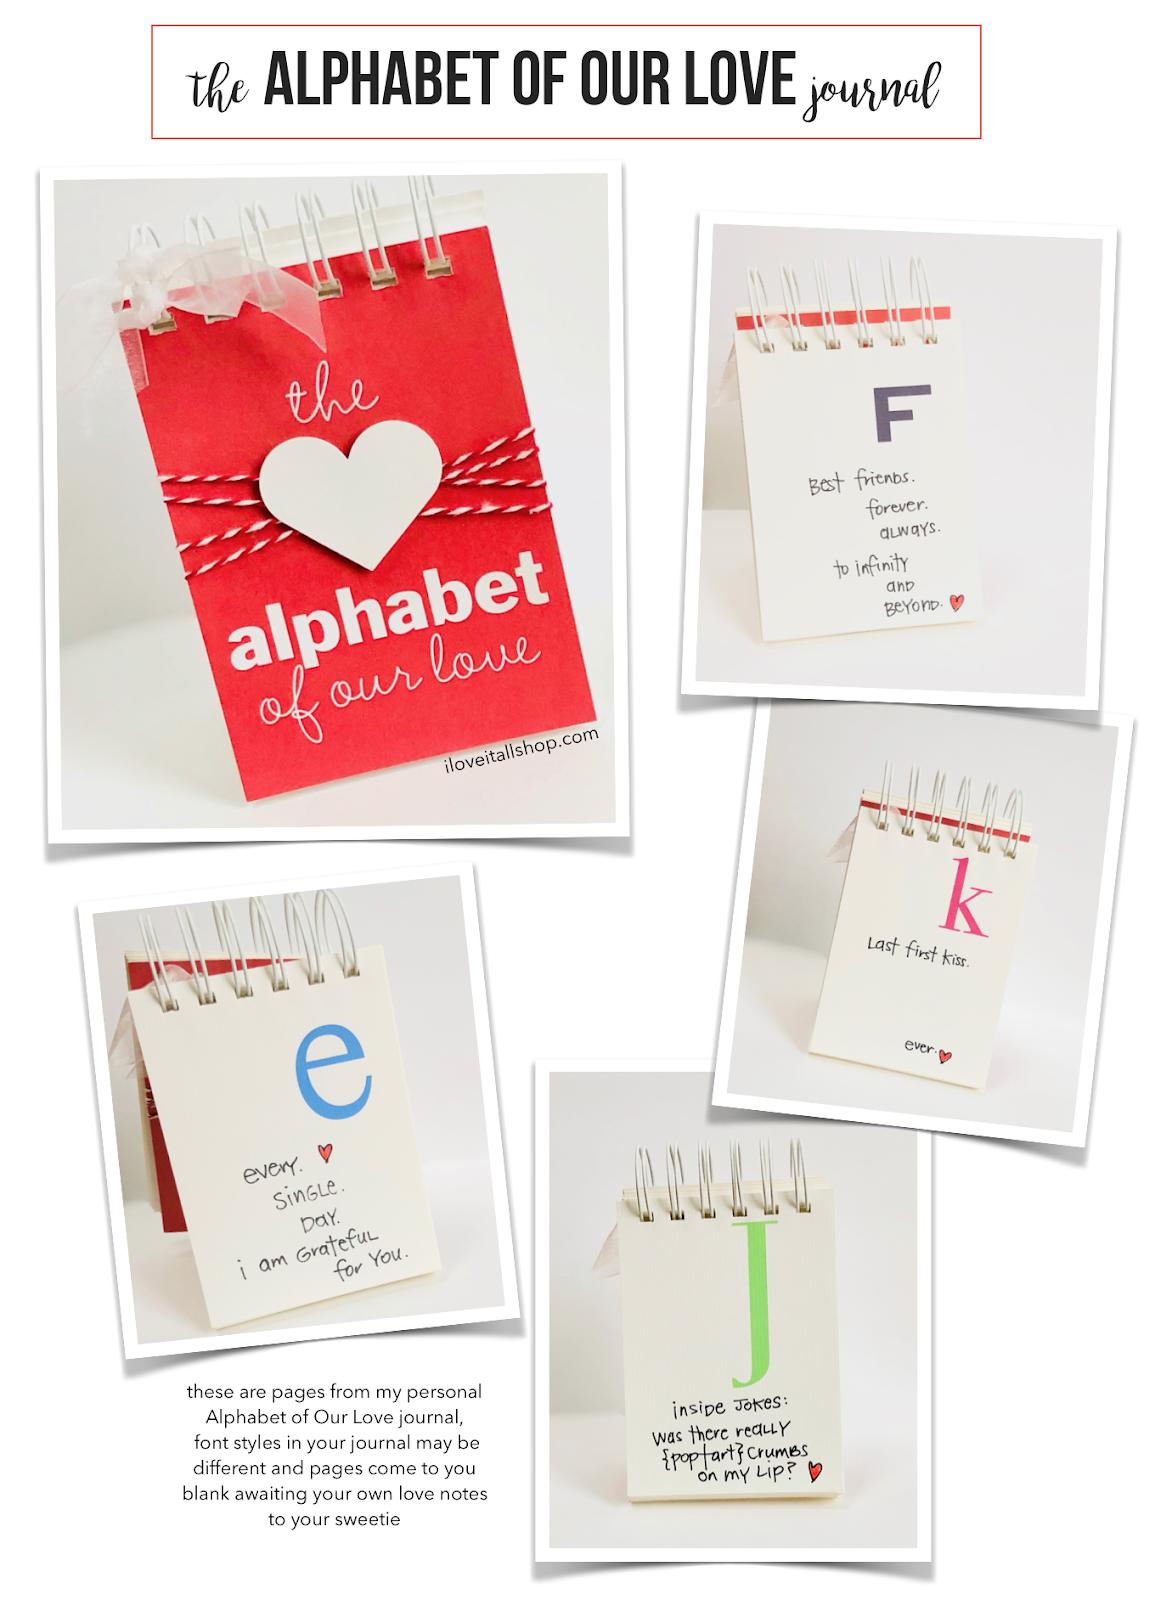 #Alphabet of Our Love #list ideas #love letters #Alphabet List Ideas #Book of Love #Love Letter Ideas #I Love It All #Letter f #Letter K #Letter J #Letter E